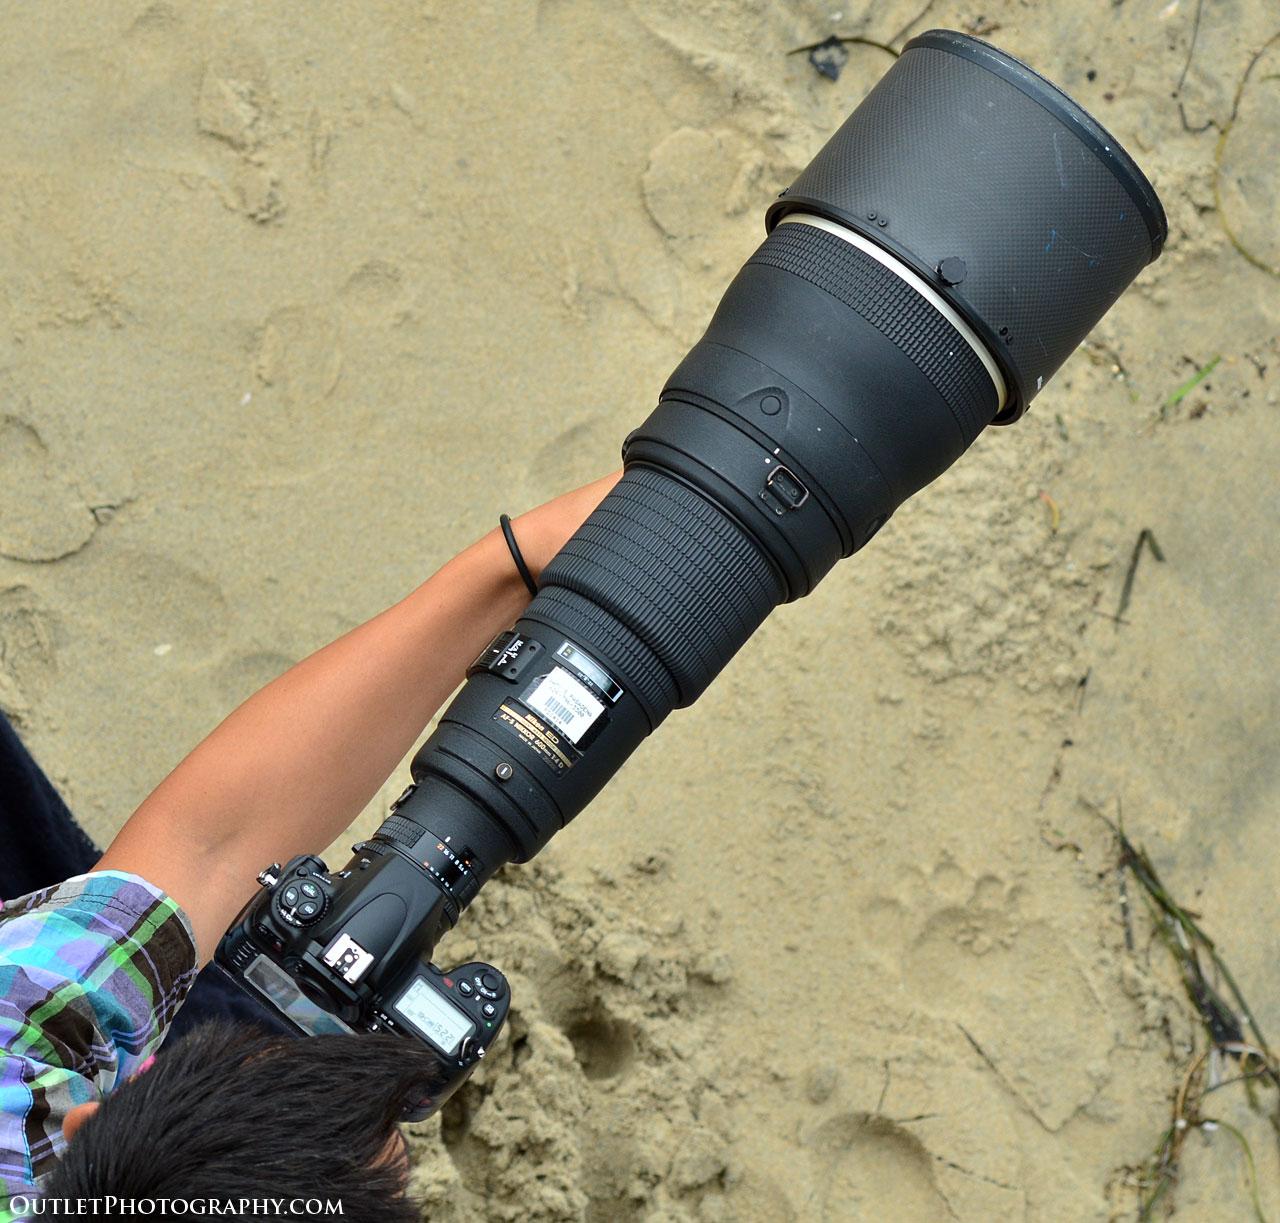 Large Nikon Lens